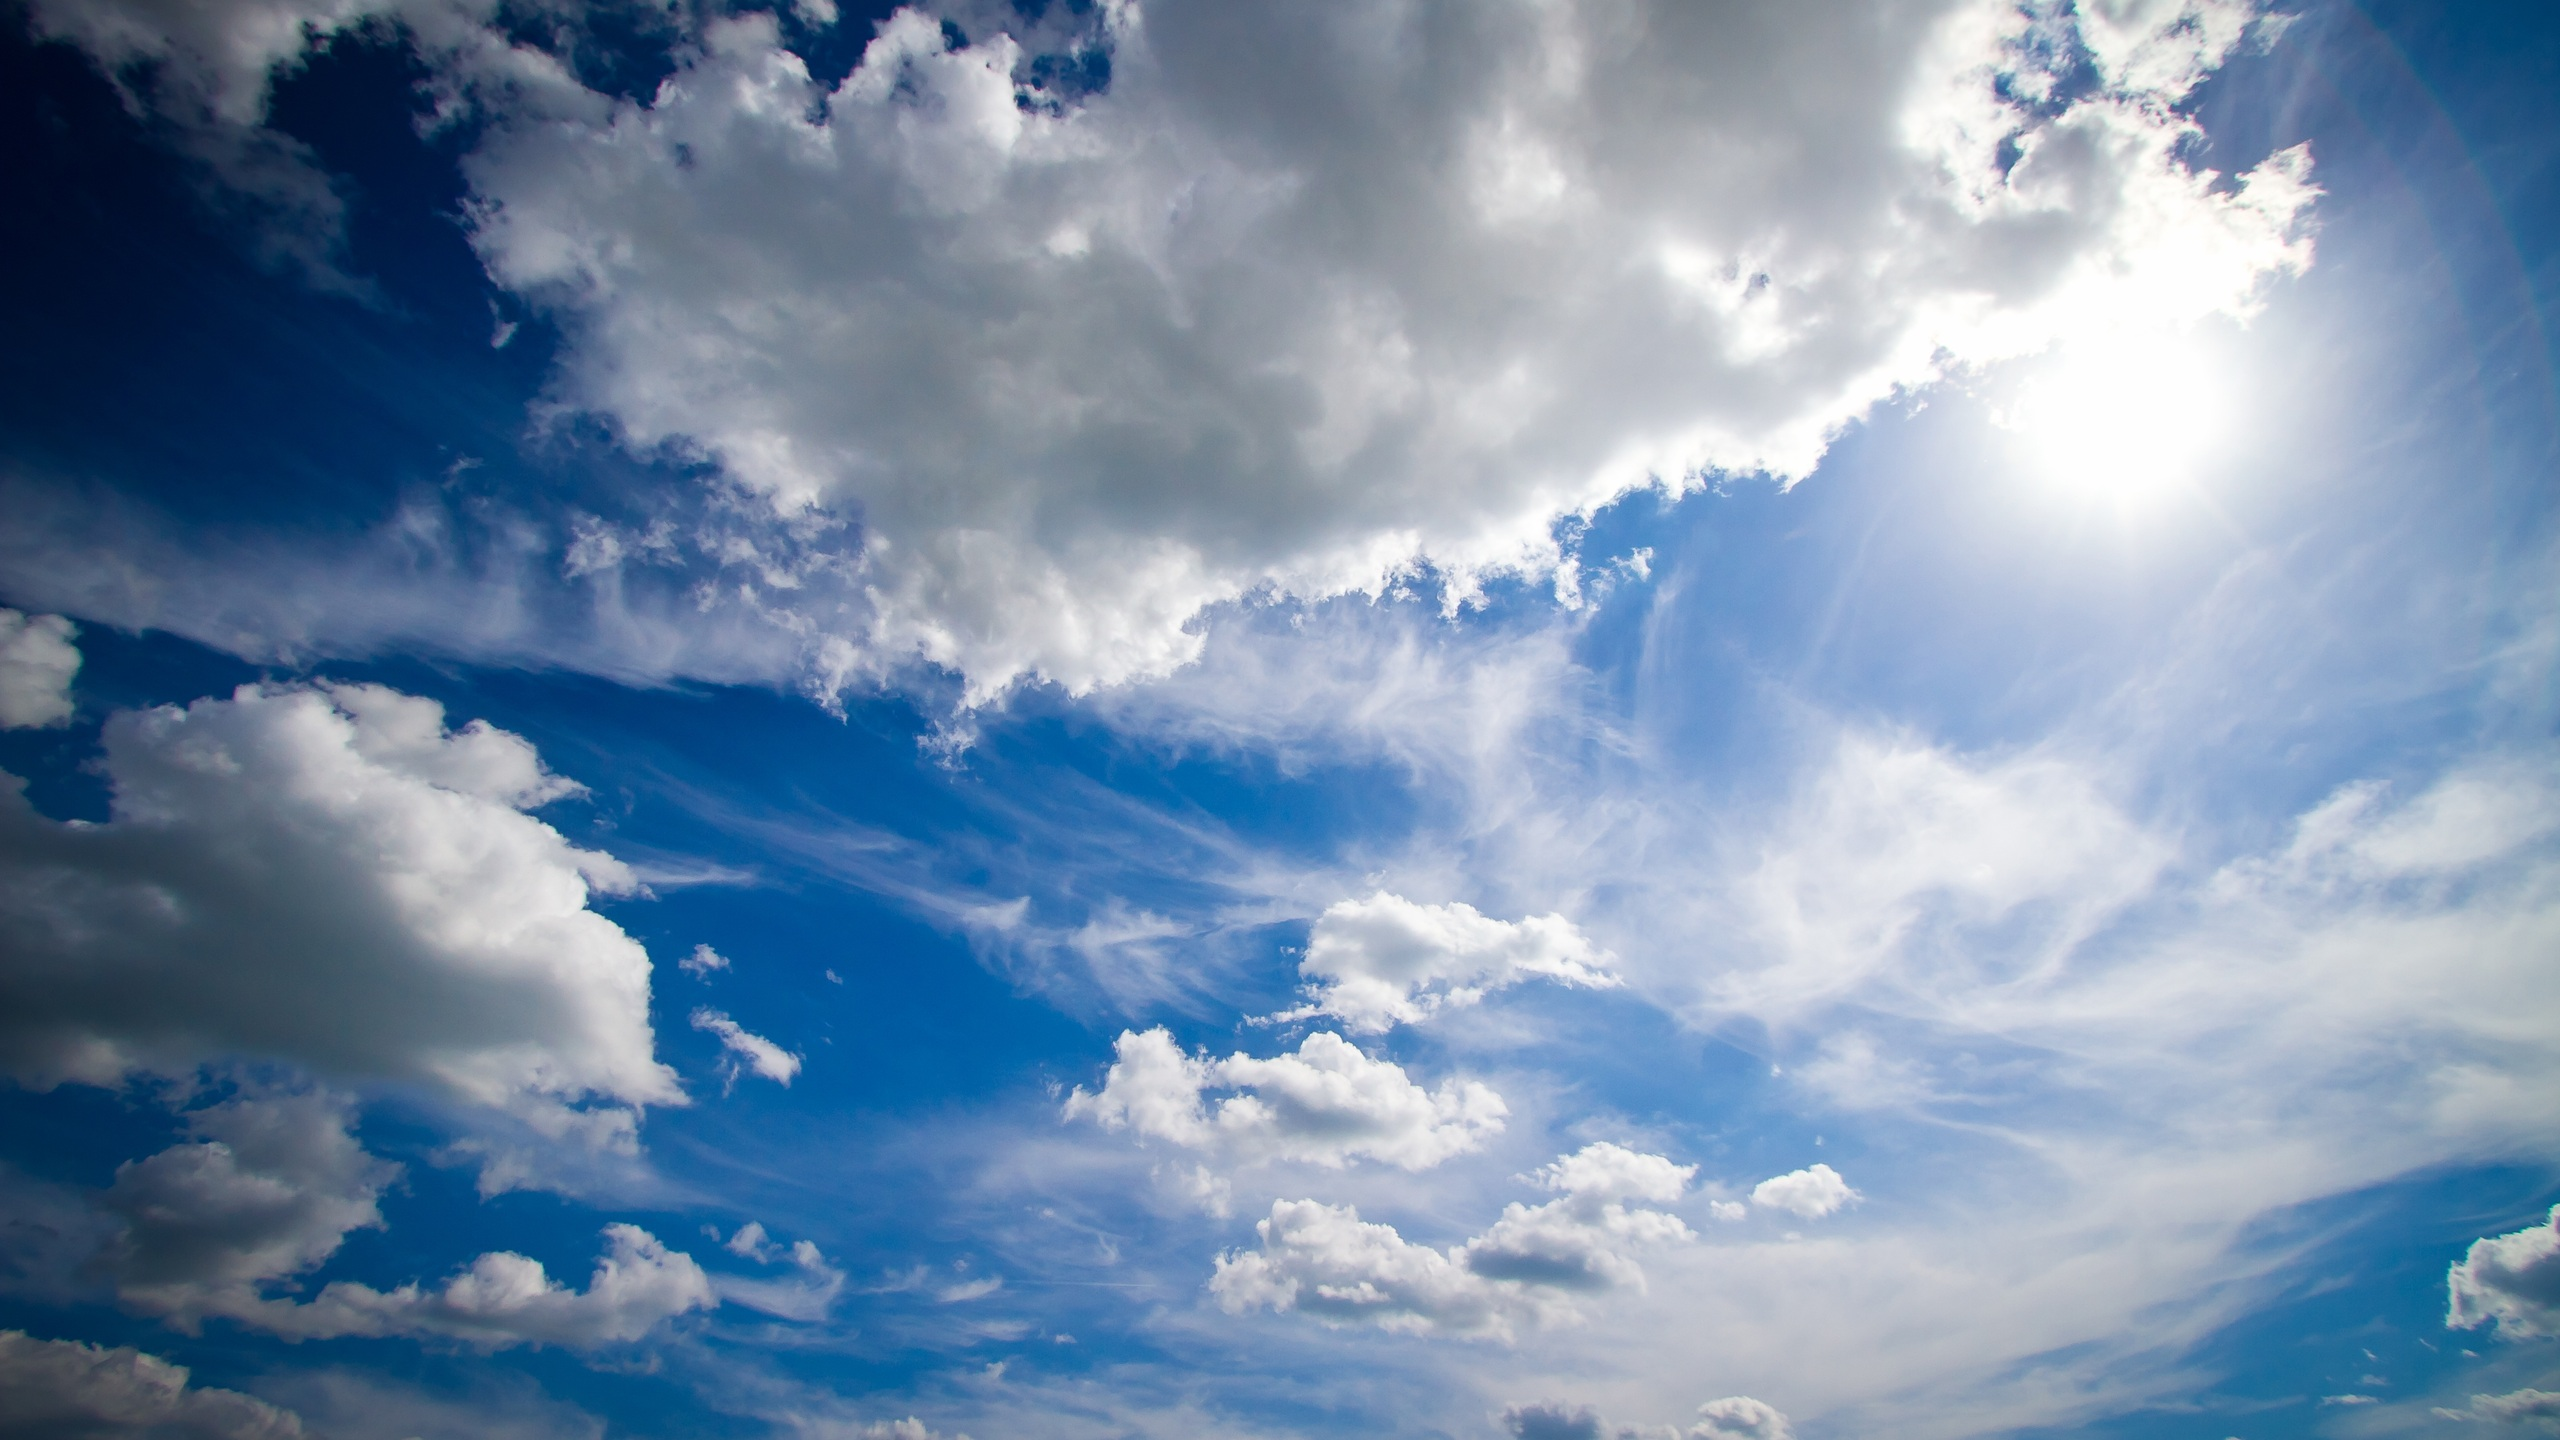 2560x1440 Blue Sky Summer 1440P Resolution HD 4k ...